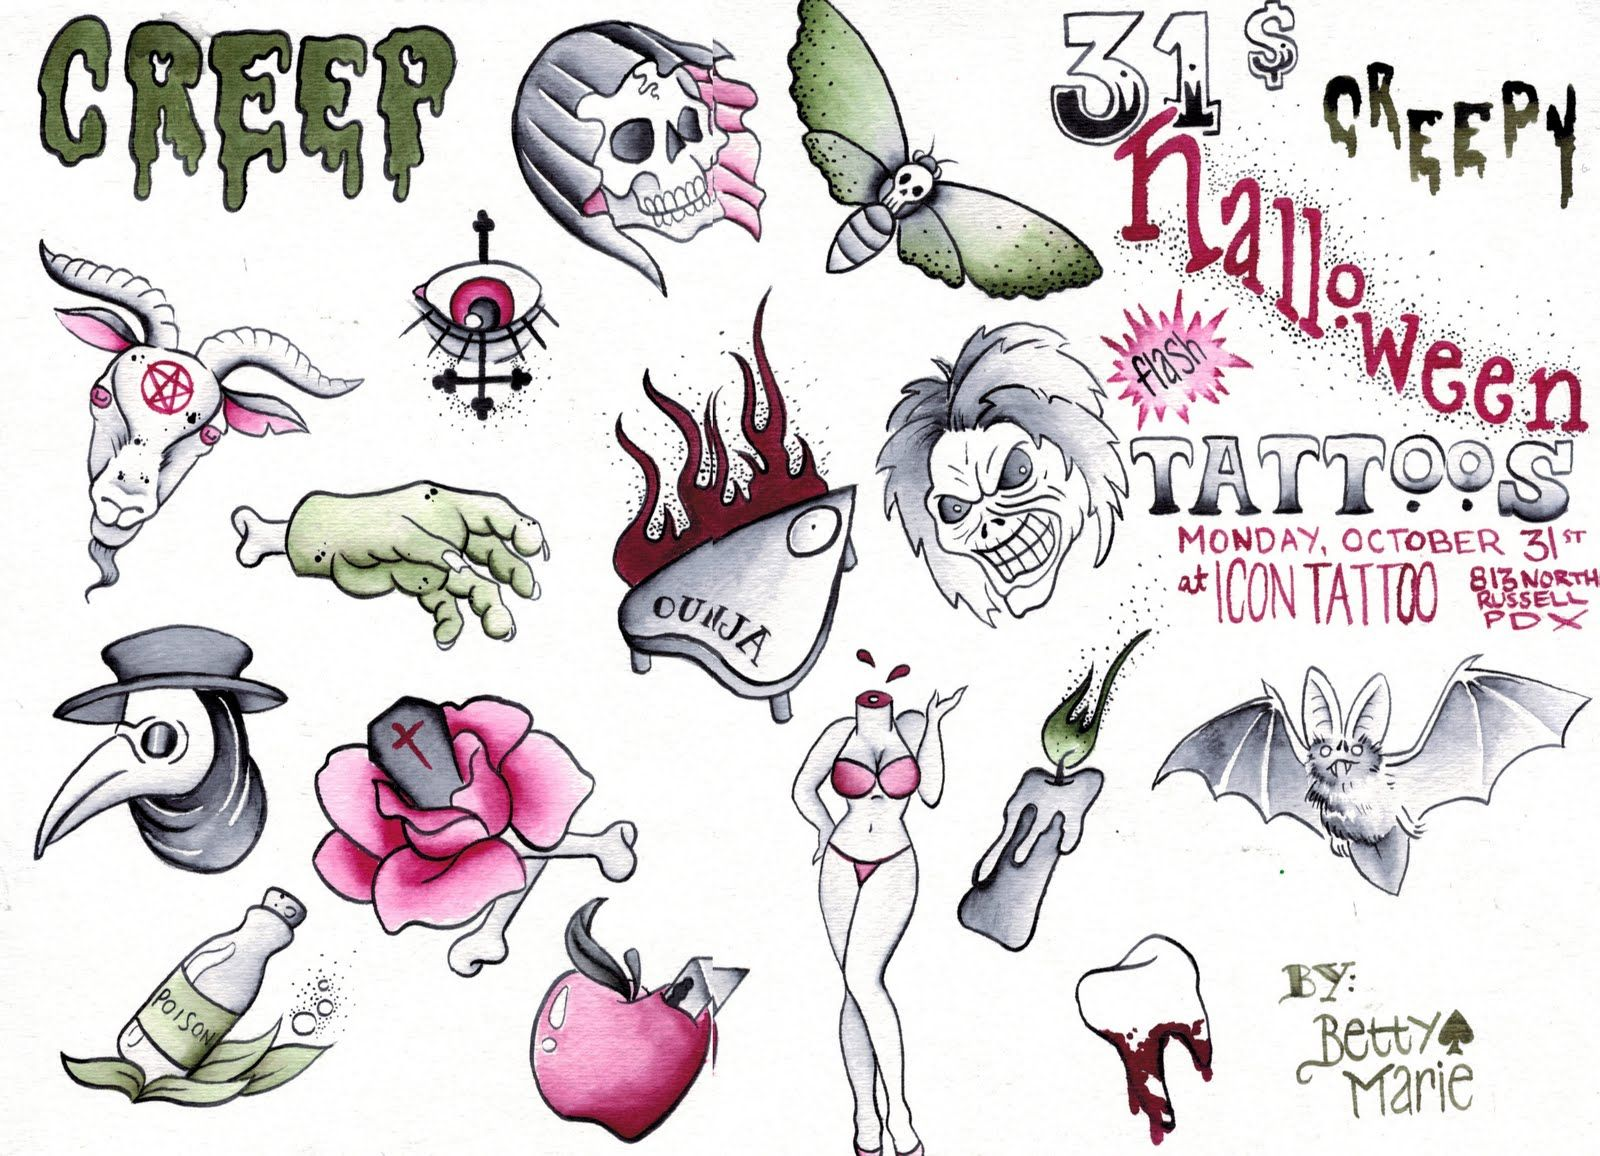 Halloween Tattoo Images & Designs Halloween tattoos